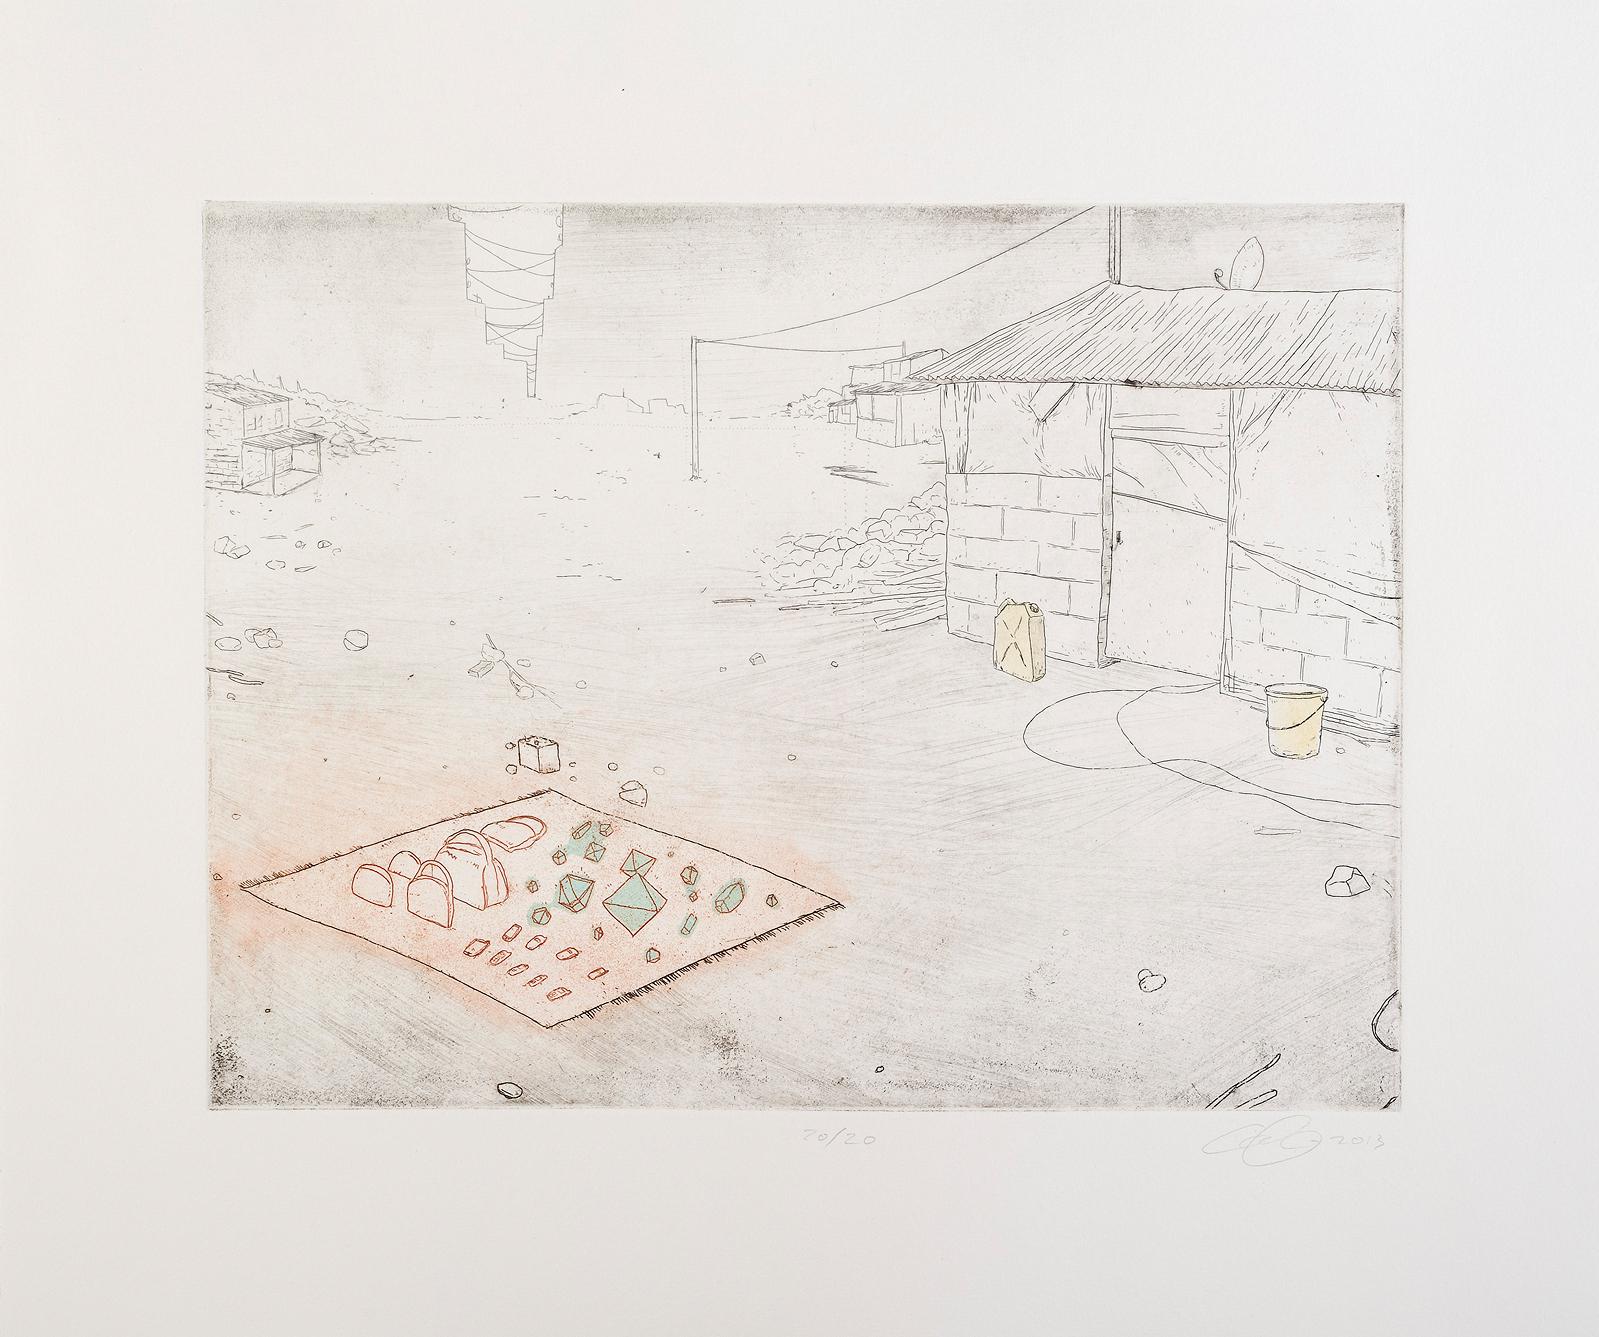 "The Romantic Machine  Intaglio with stencil 9x12"", ed 20, 2013 Printed at Fresno State University"